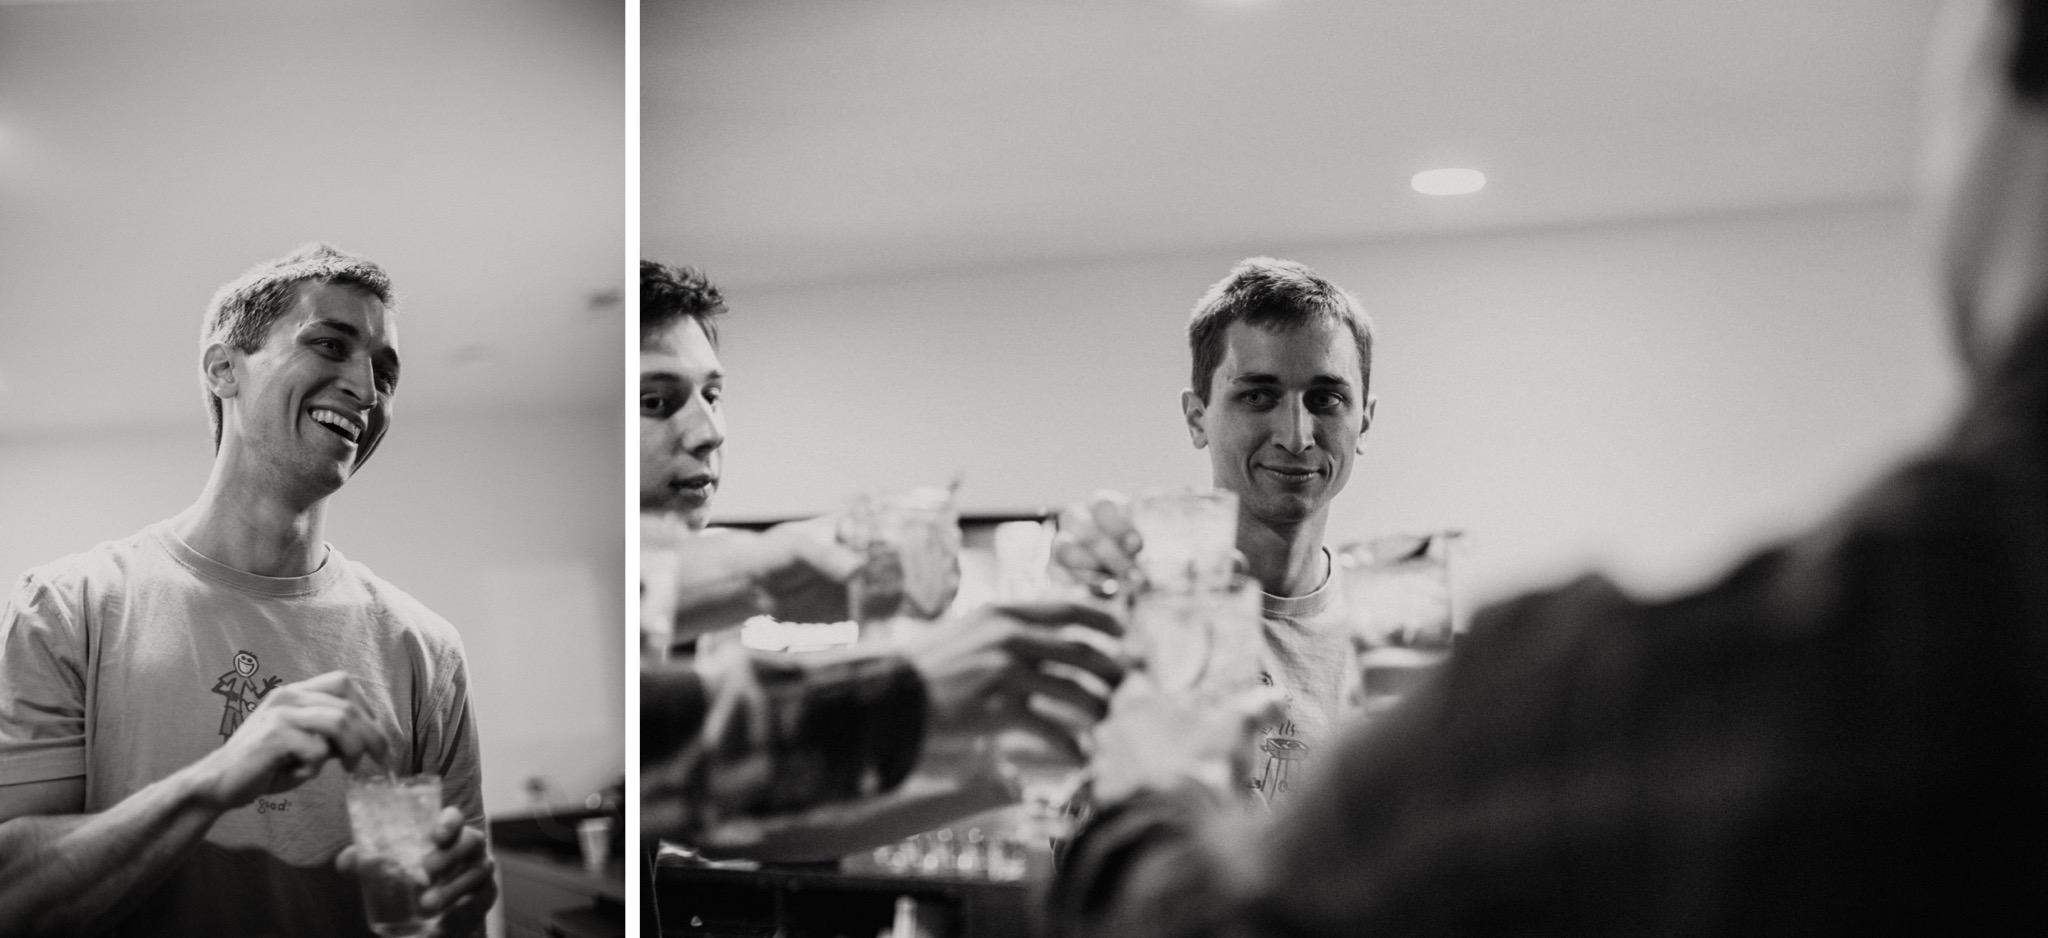 08_West Manor Estate Weddings - Pat Cori Photography-14_West Manor Estate Weddings - Pat Cori Photography-13_Portraits_PatCoriPhotography_groom_VirginiaWeddingPhotographer_WestManorEstate_gettingready.jpg